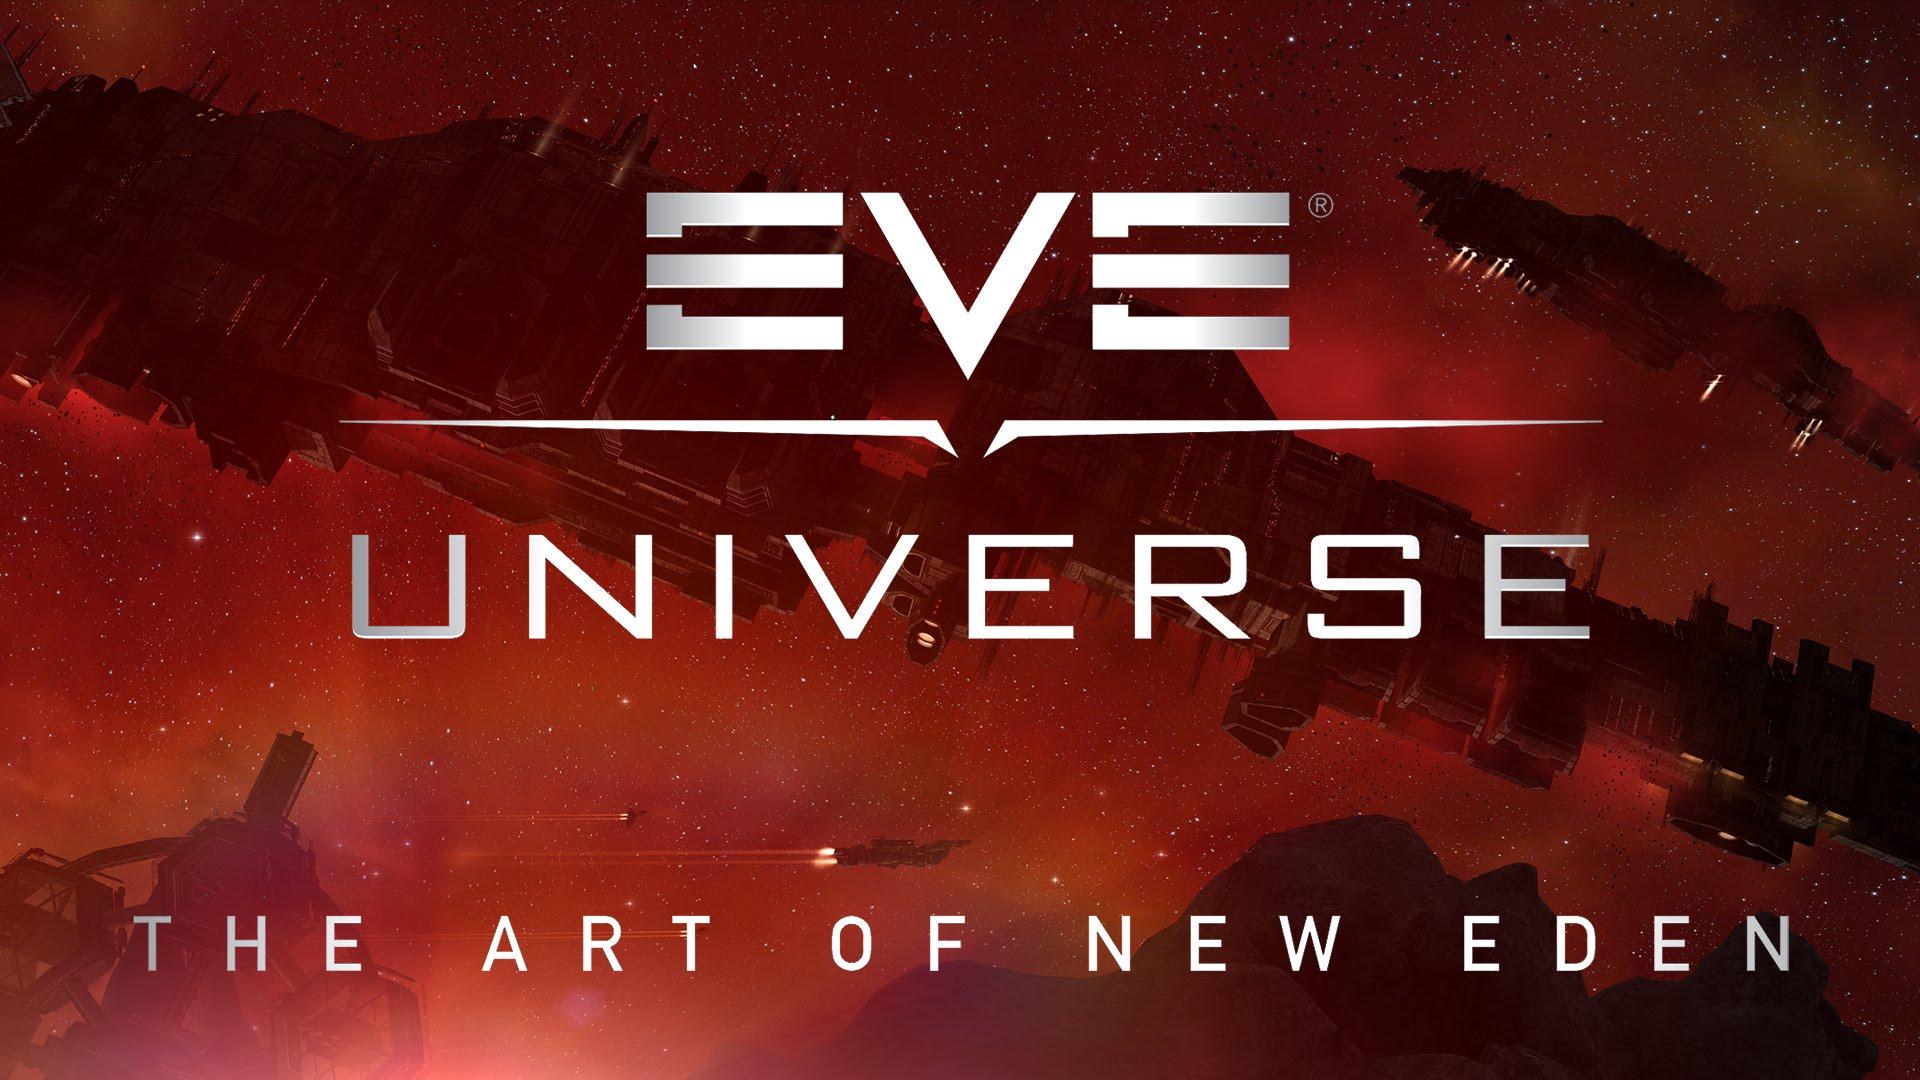 EVE Universe - Art of New Eden Video Thumbnail